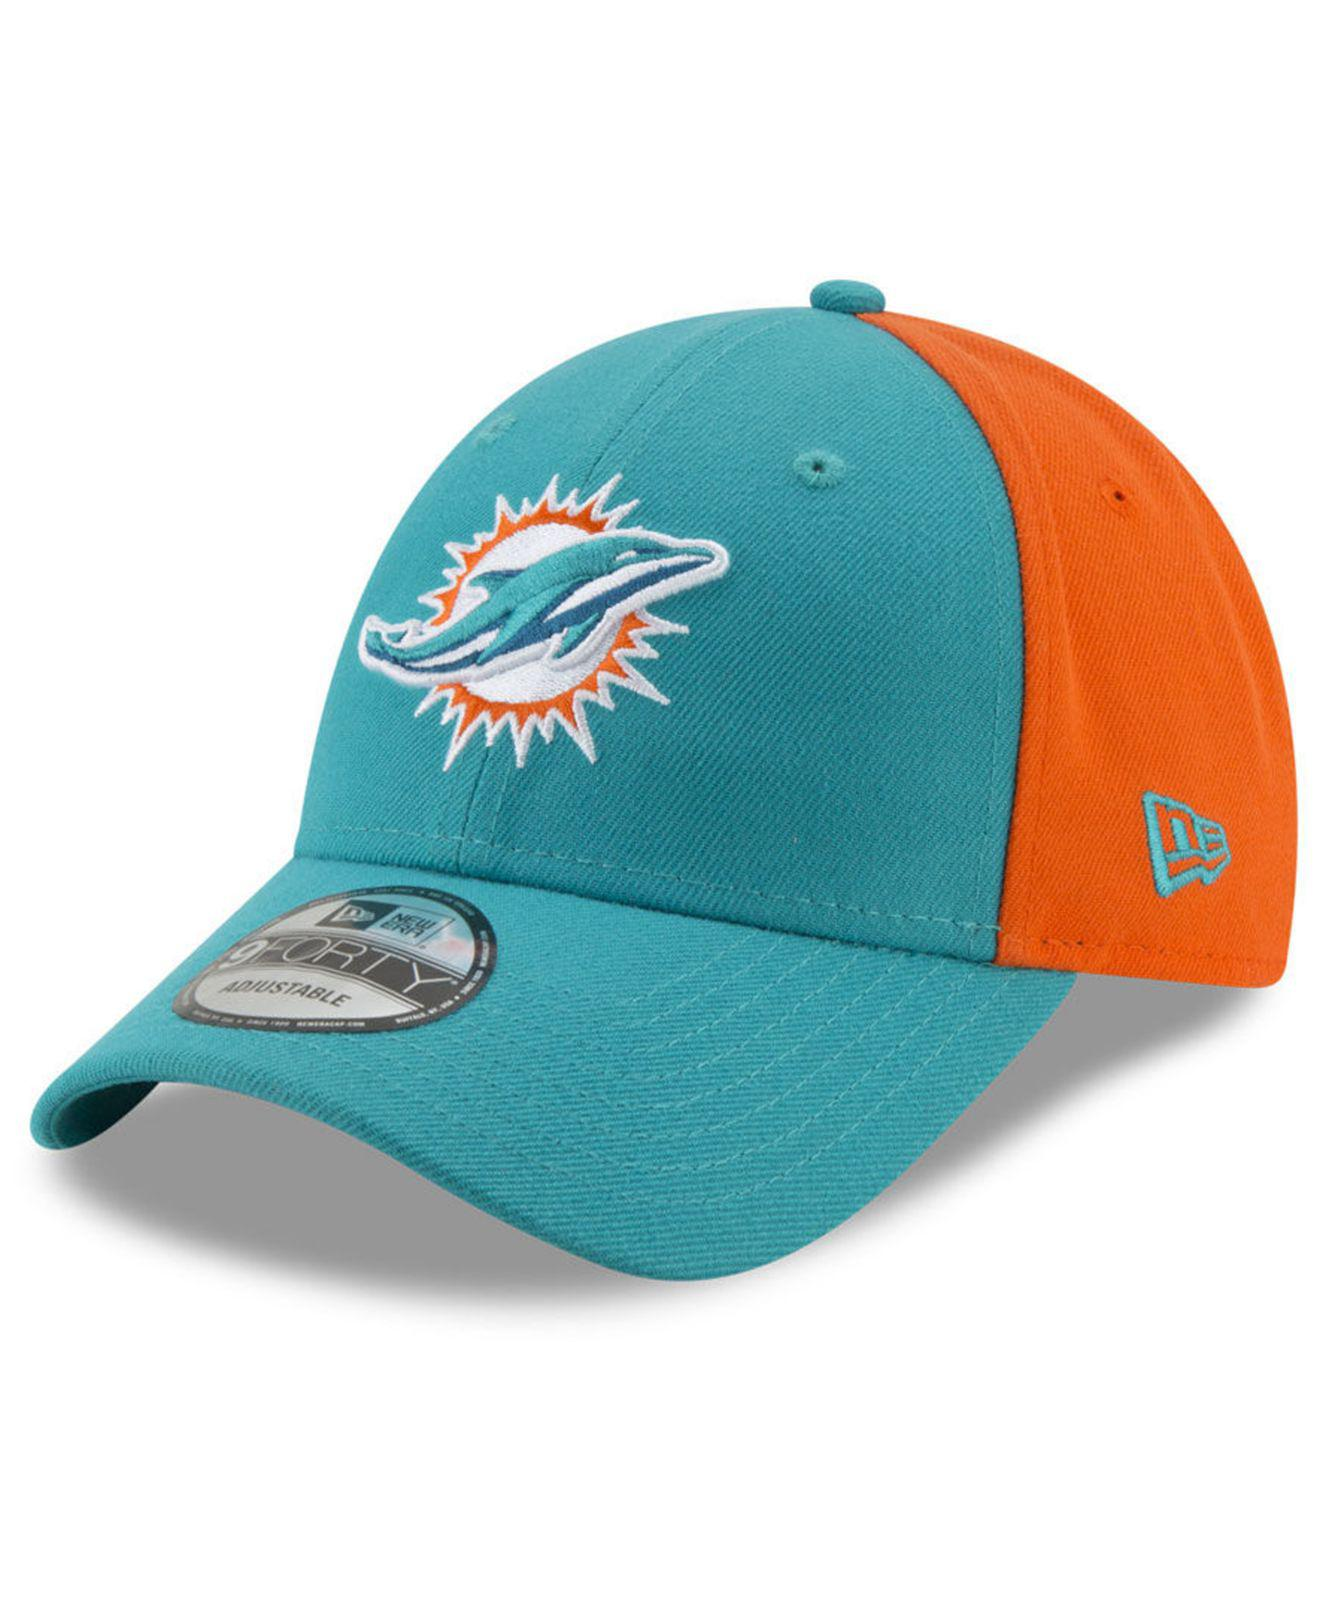 info for e5a0d 58ac1 ... new arrivals ktz. mens blue miami dolphins team blocked 9forty cap  c231f 5e51f